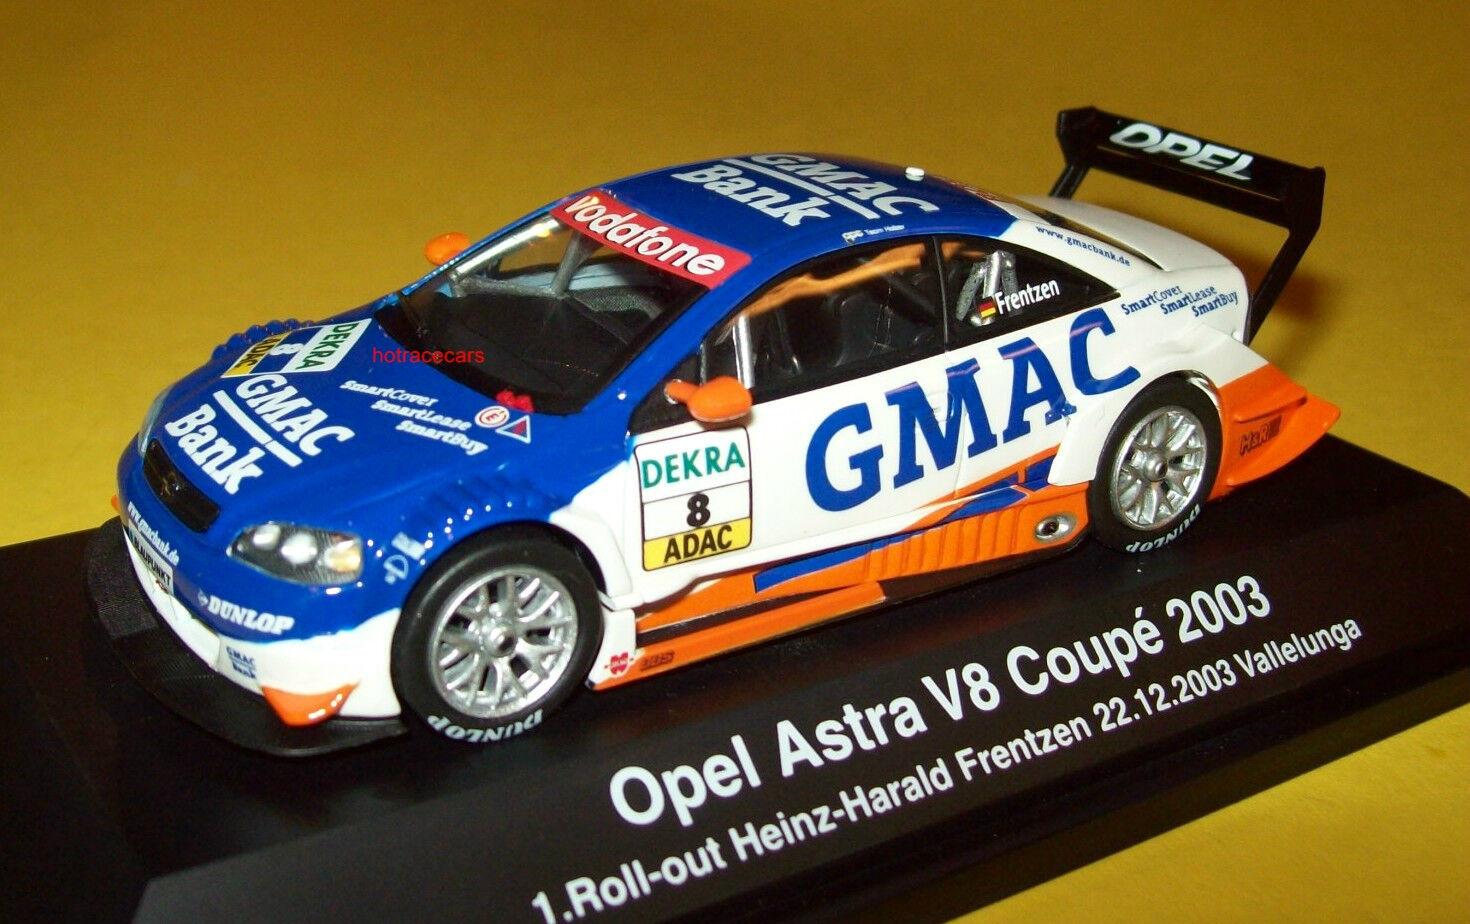 Schuco Opel Astra V8 Coupe 2003 Heinz-Harold Frentzen  8 Team Holzer Vallelunga